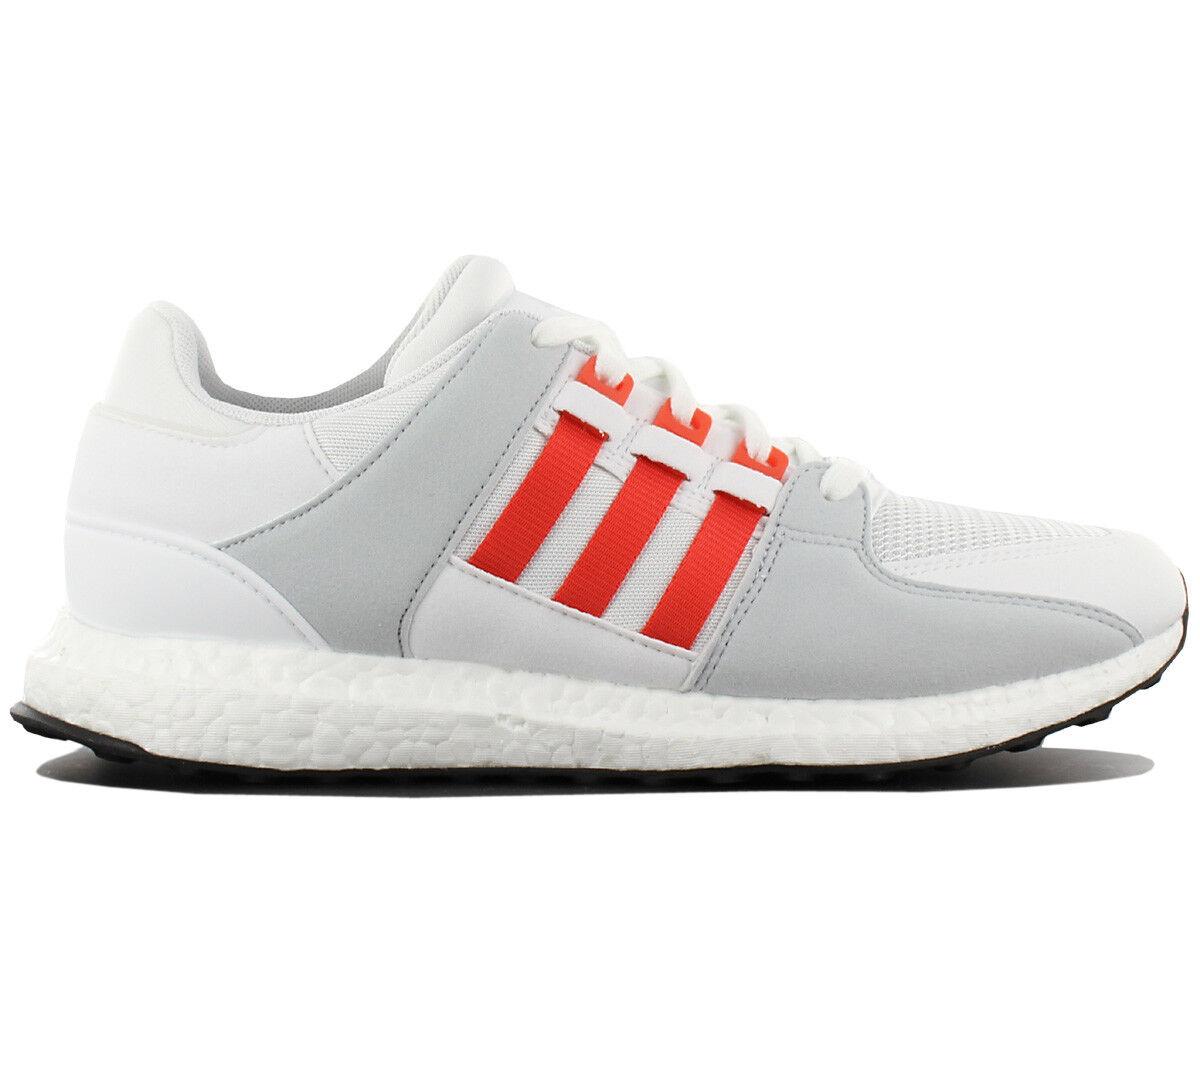 Adidas Originals EQT equipment equipment equipment support ultra Boost calcetines cortos zapatos by9532  caliente